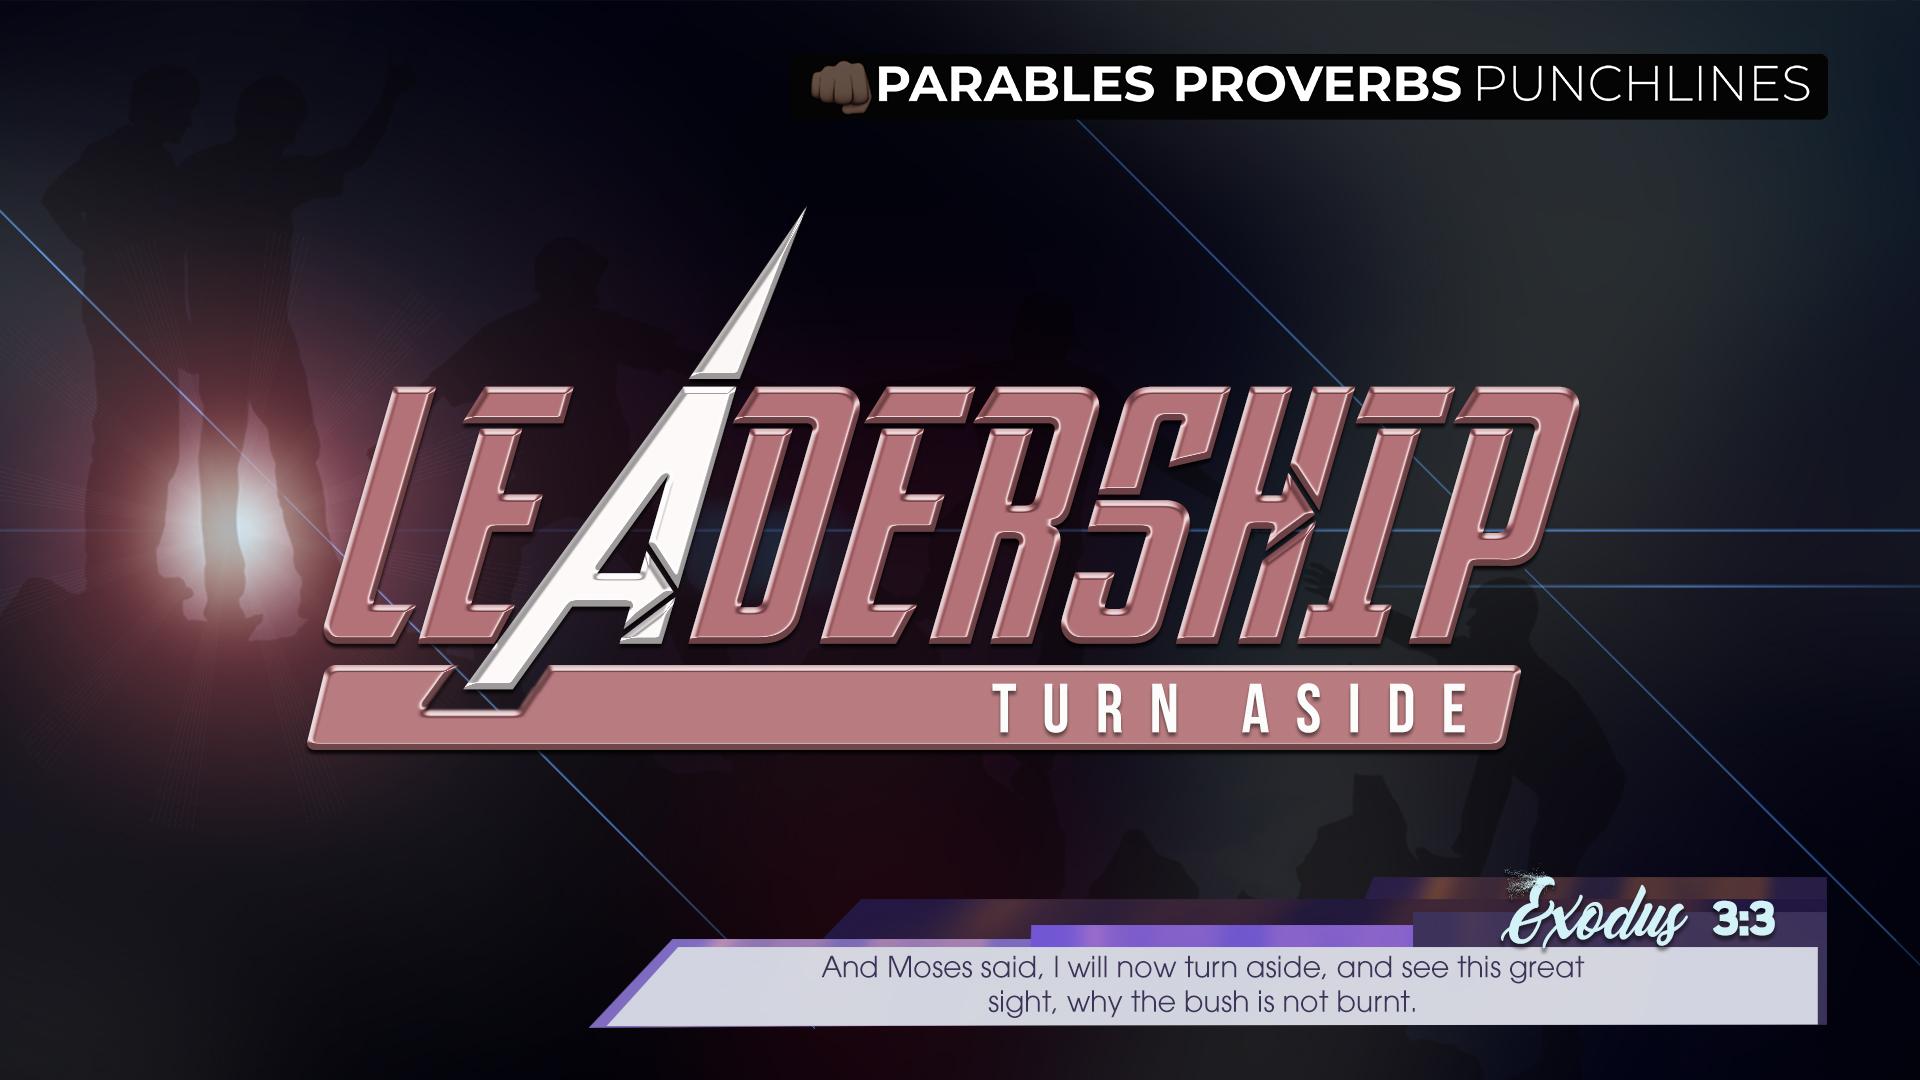 LEADERSHIP – Respond Turn Aside